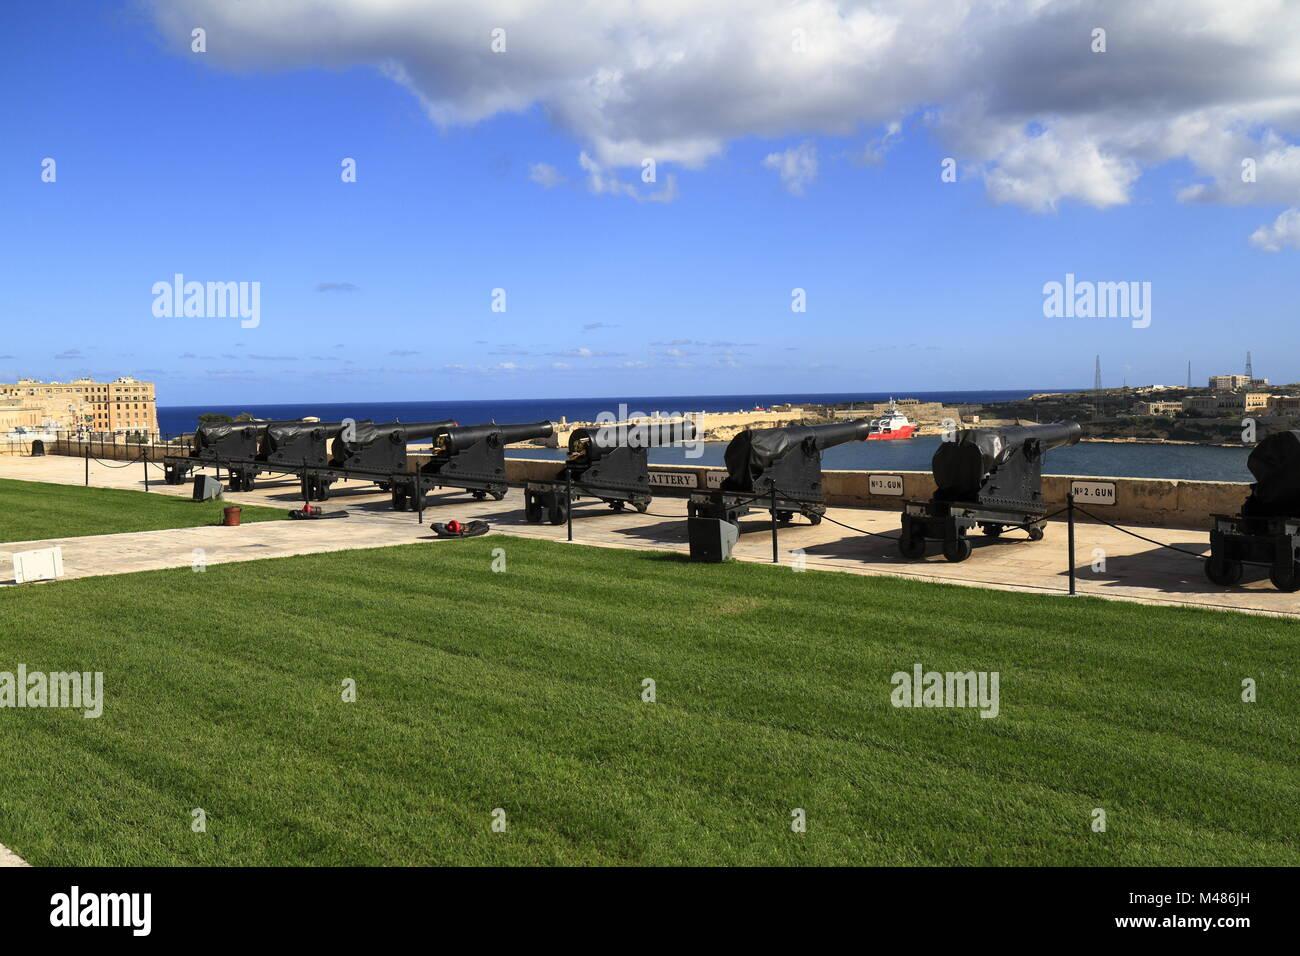 Gun Fire of saluting Lascaris Battery in Valletta, Malta - Stock Image